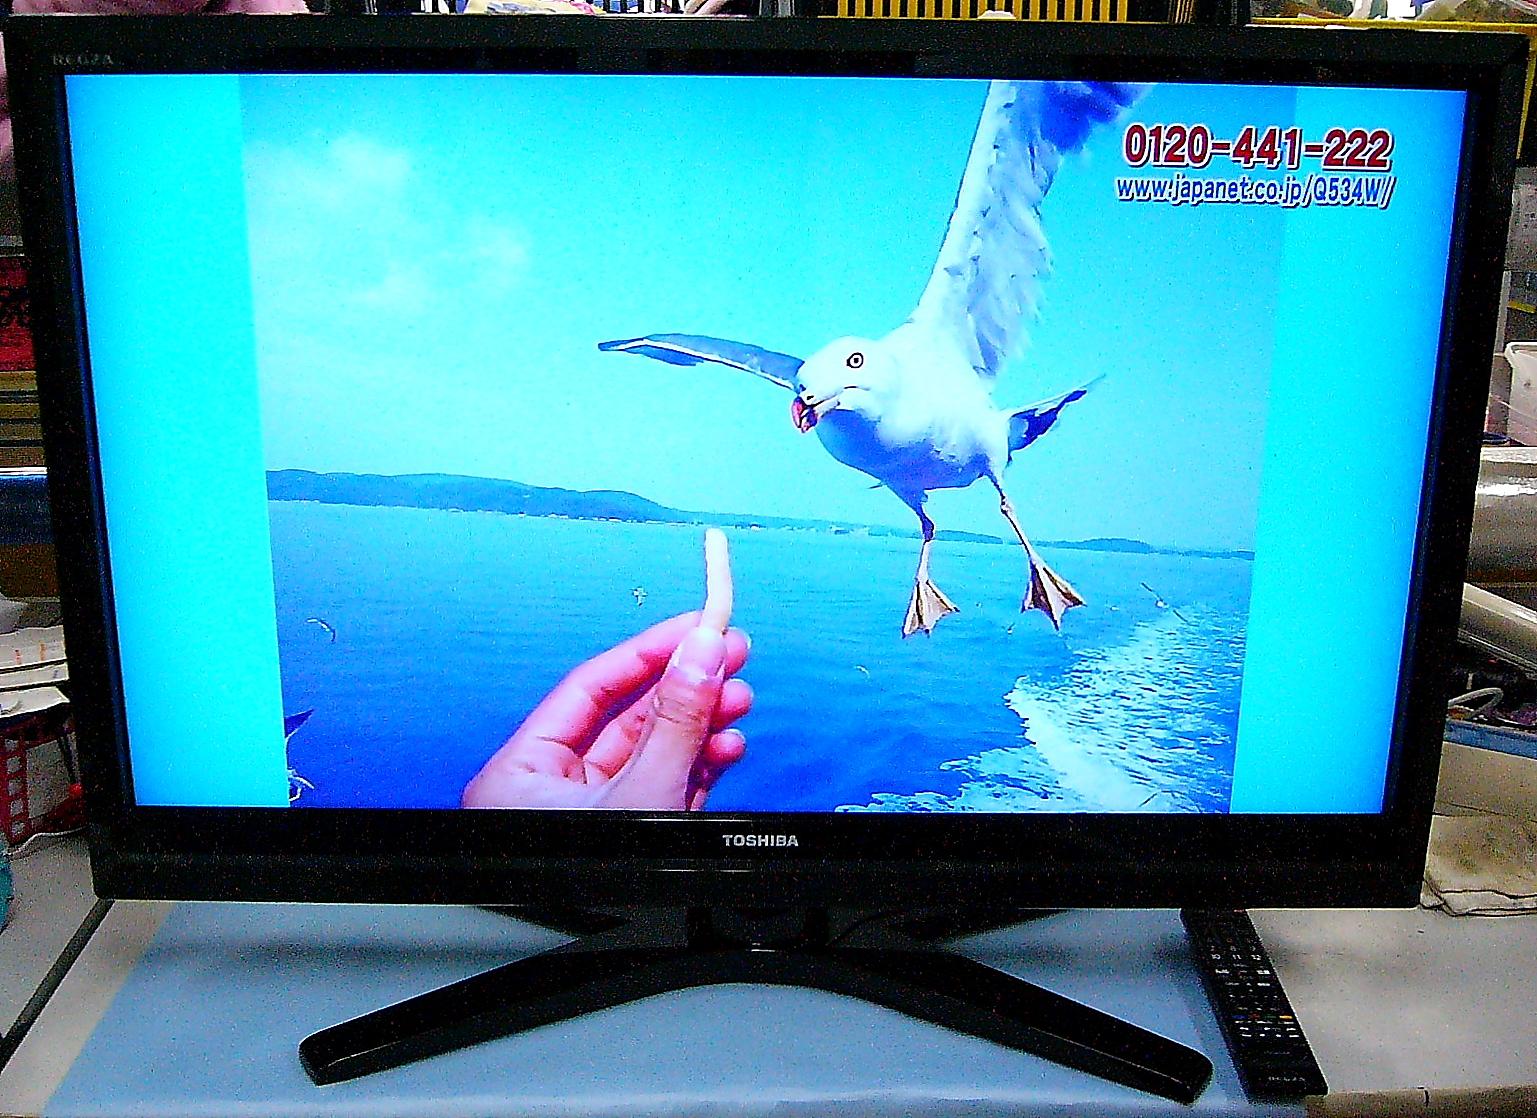 SHARP 液晶テレビ REGZA 42R1